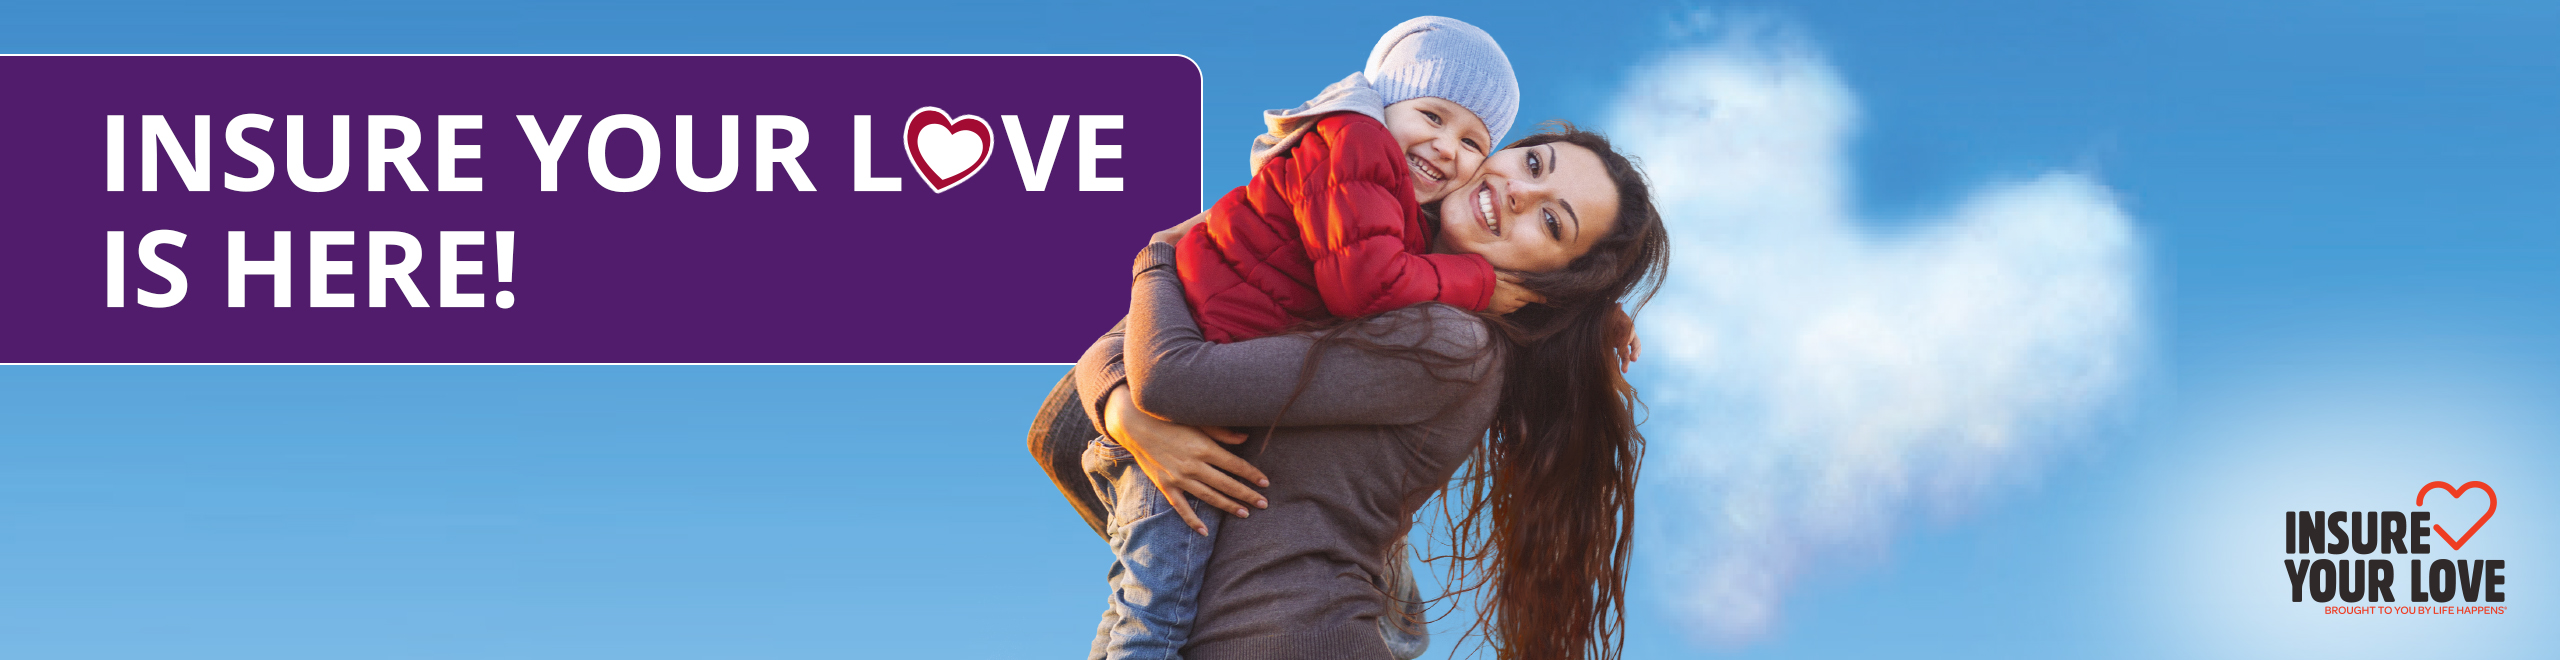 illinois mutual life insurance company